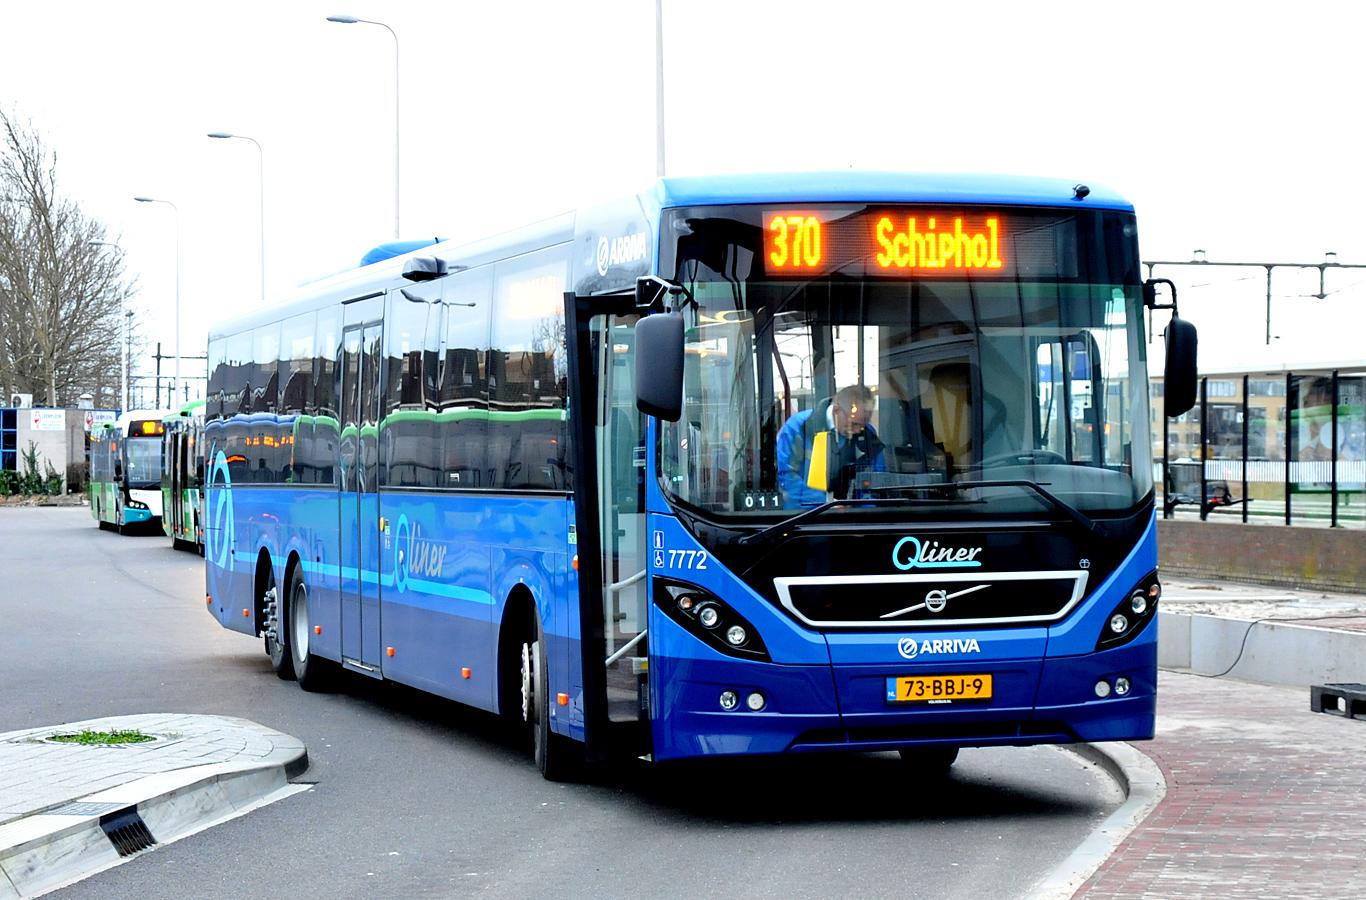 Arriva_7772_Volvo8900LE.jpg